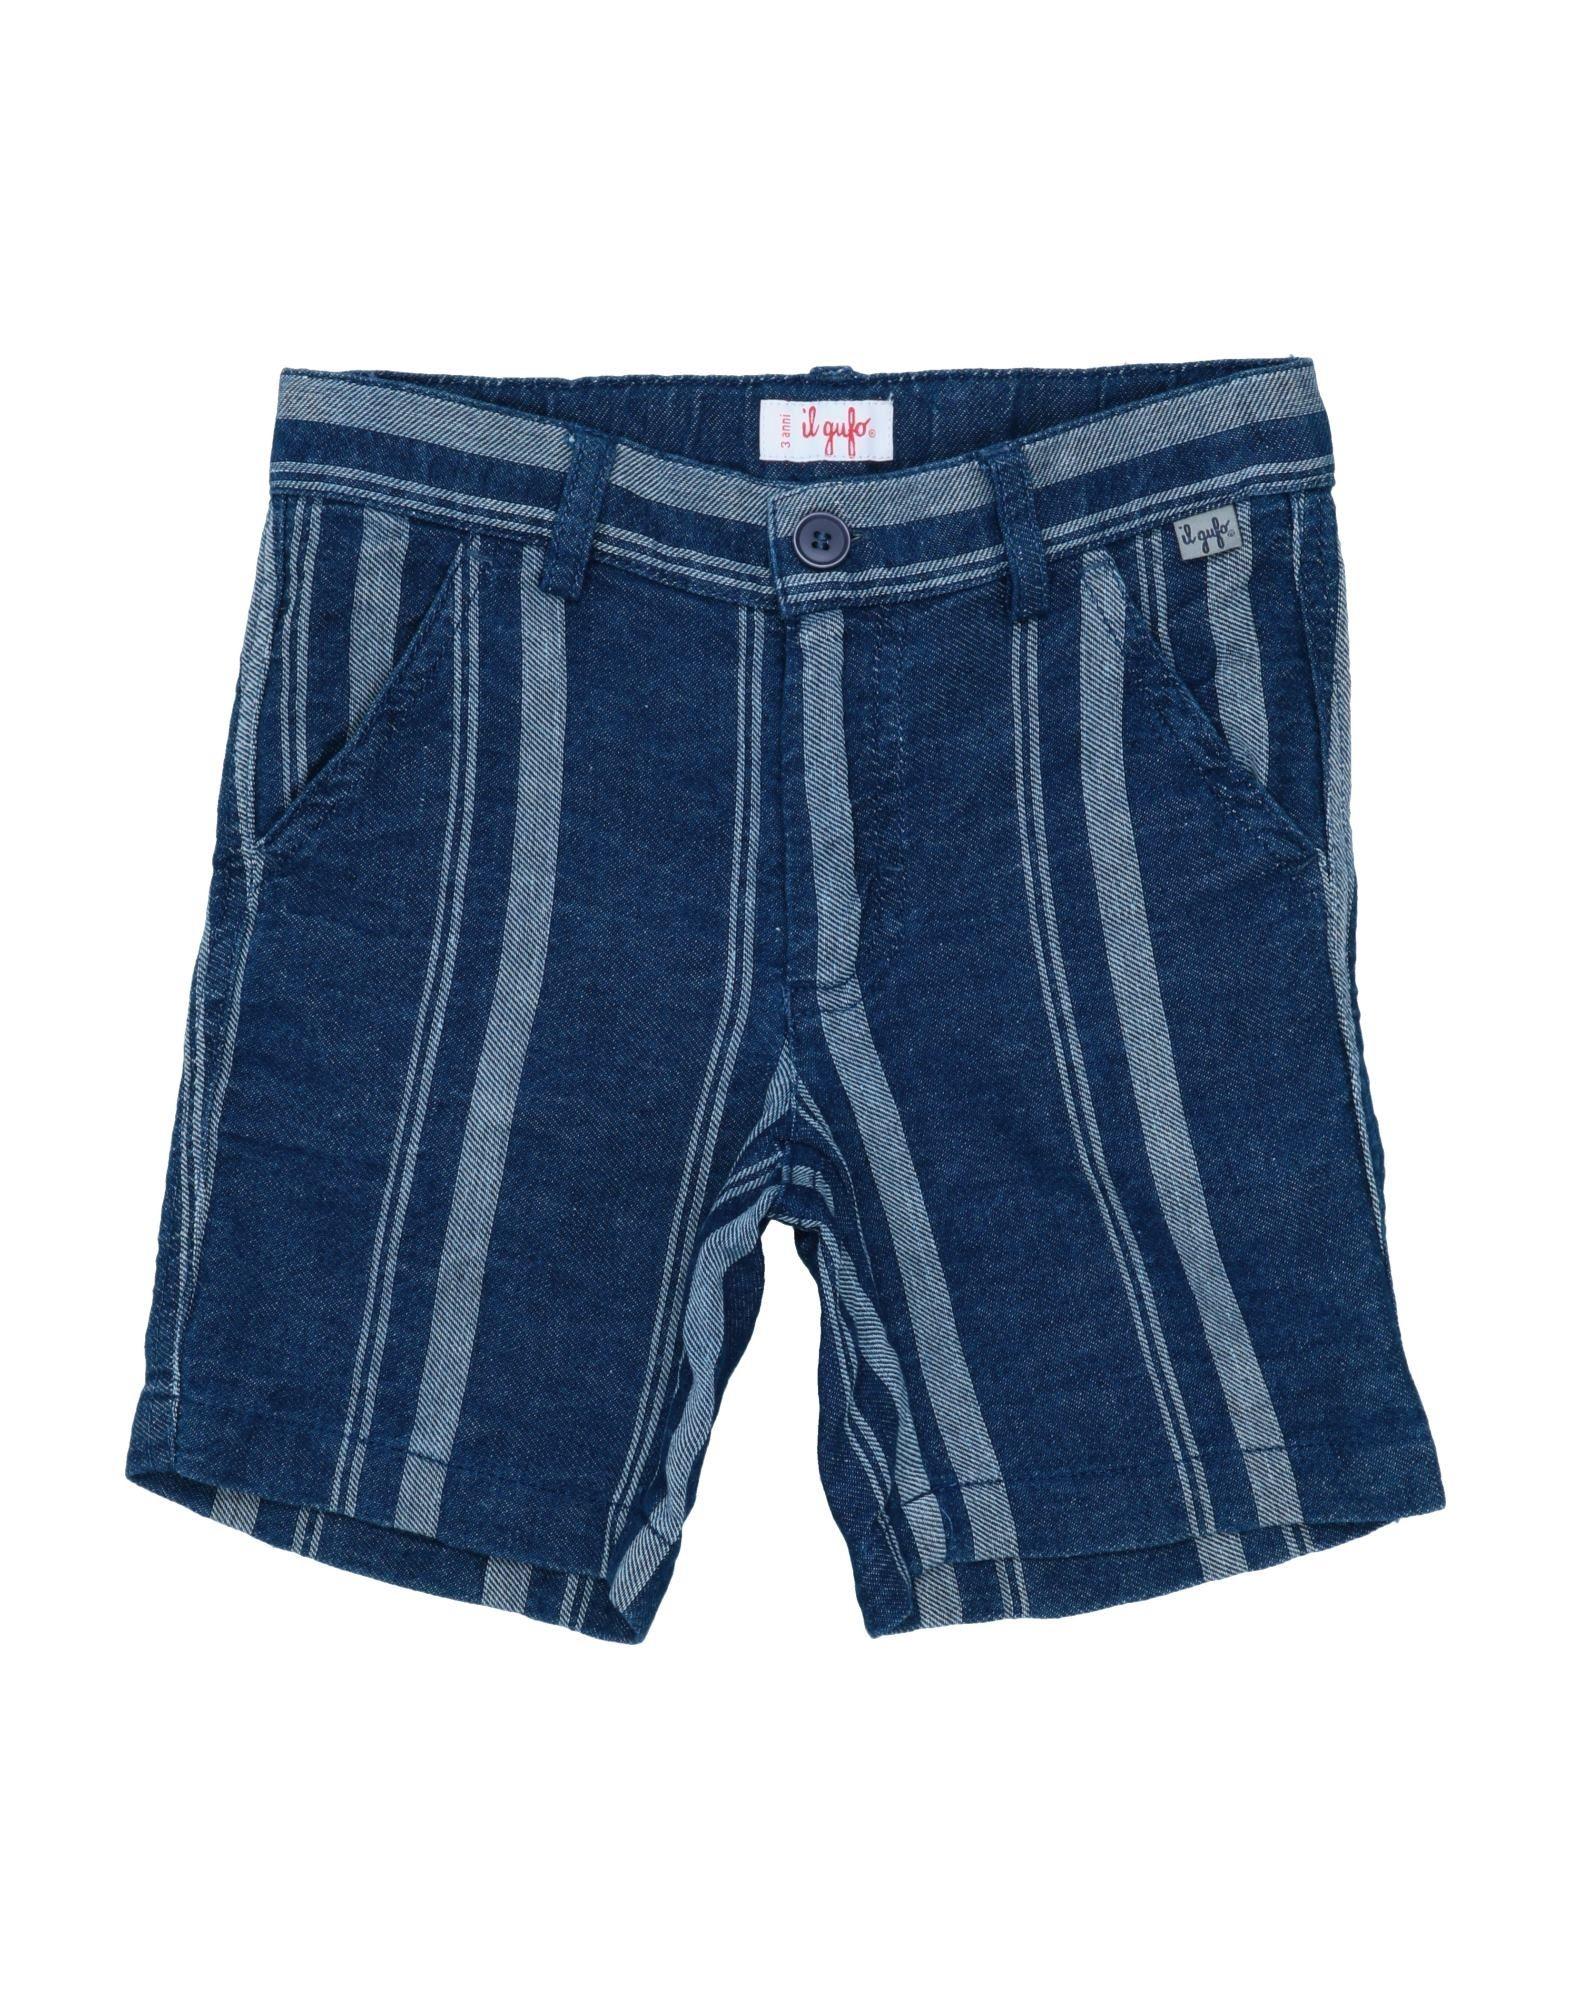 IL GUFO Джинсовые бермуды il gufo джинсовые брюки